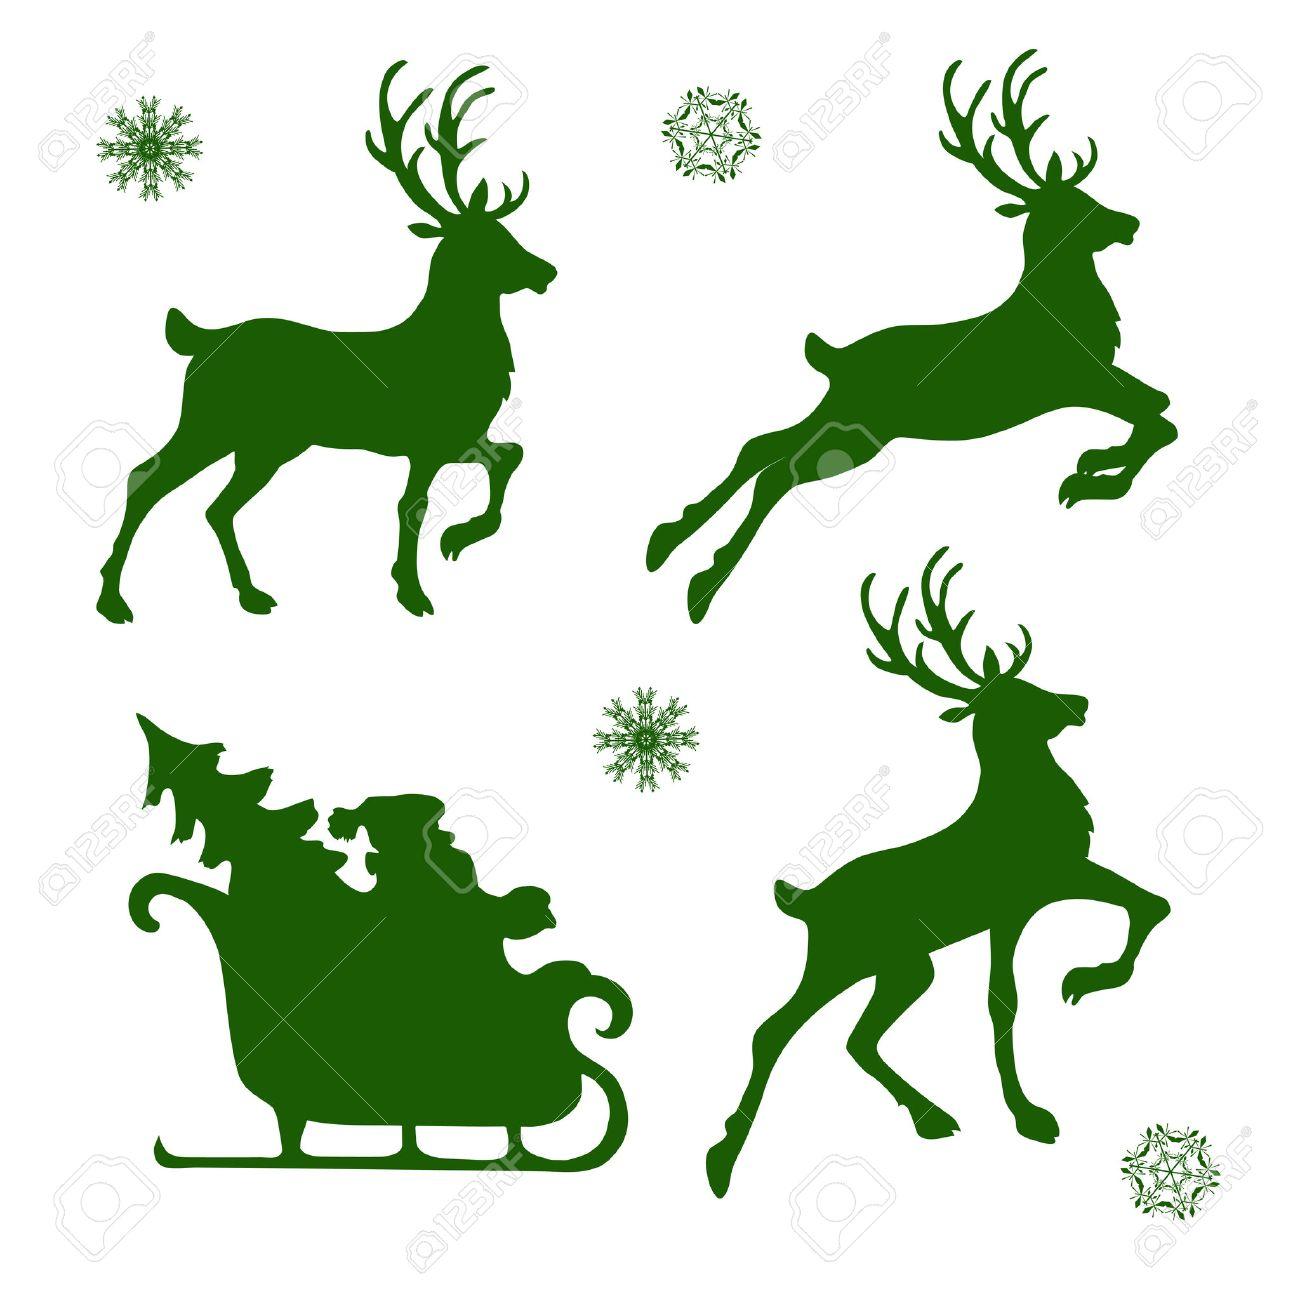 Christmas Reindeer Silhouette.Set Of Silhouettes Of Christmas Reindeer And Santa